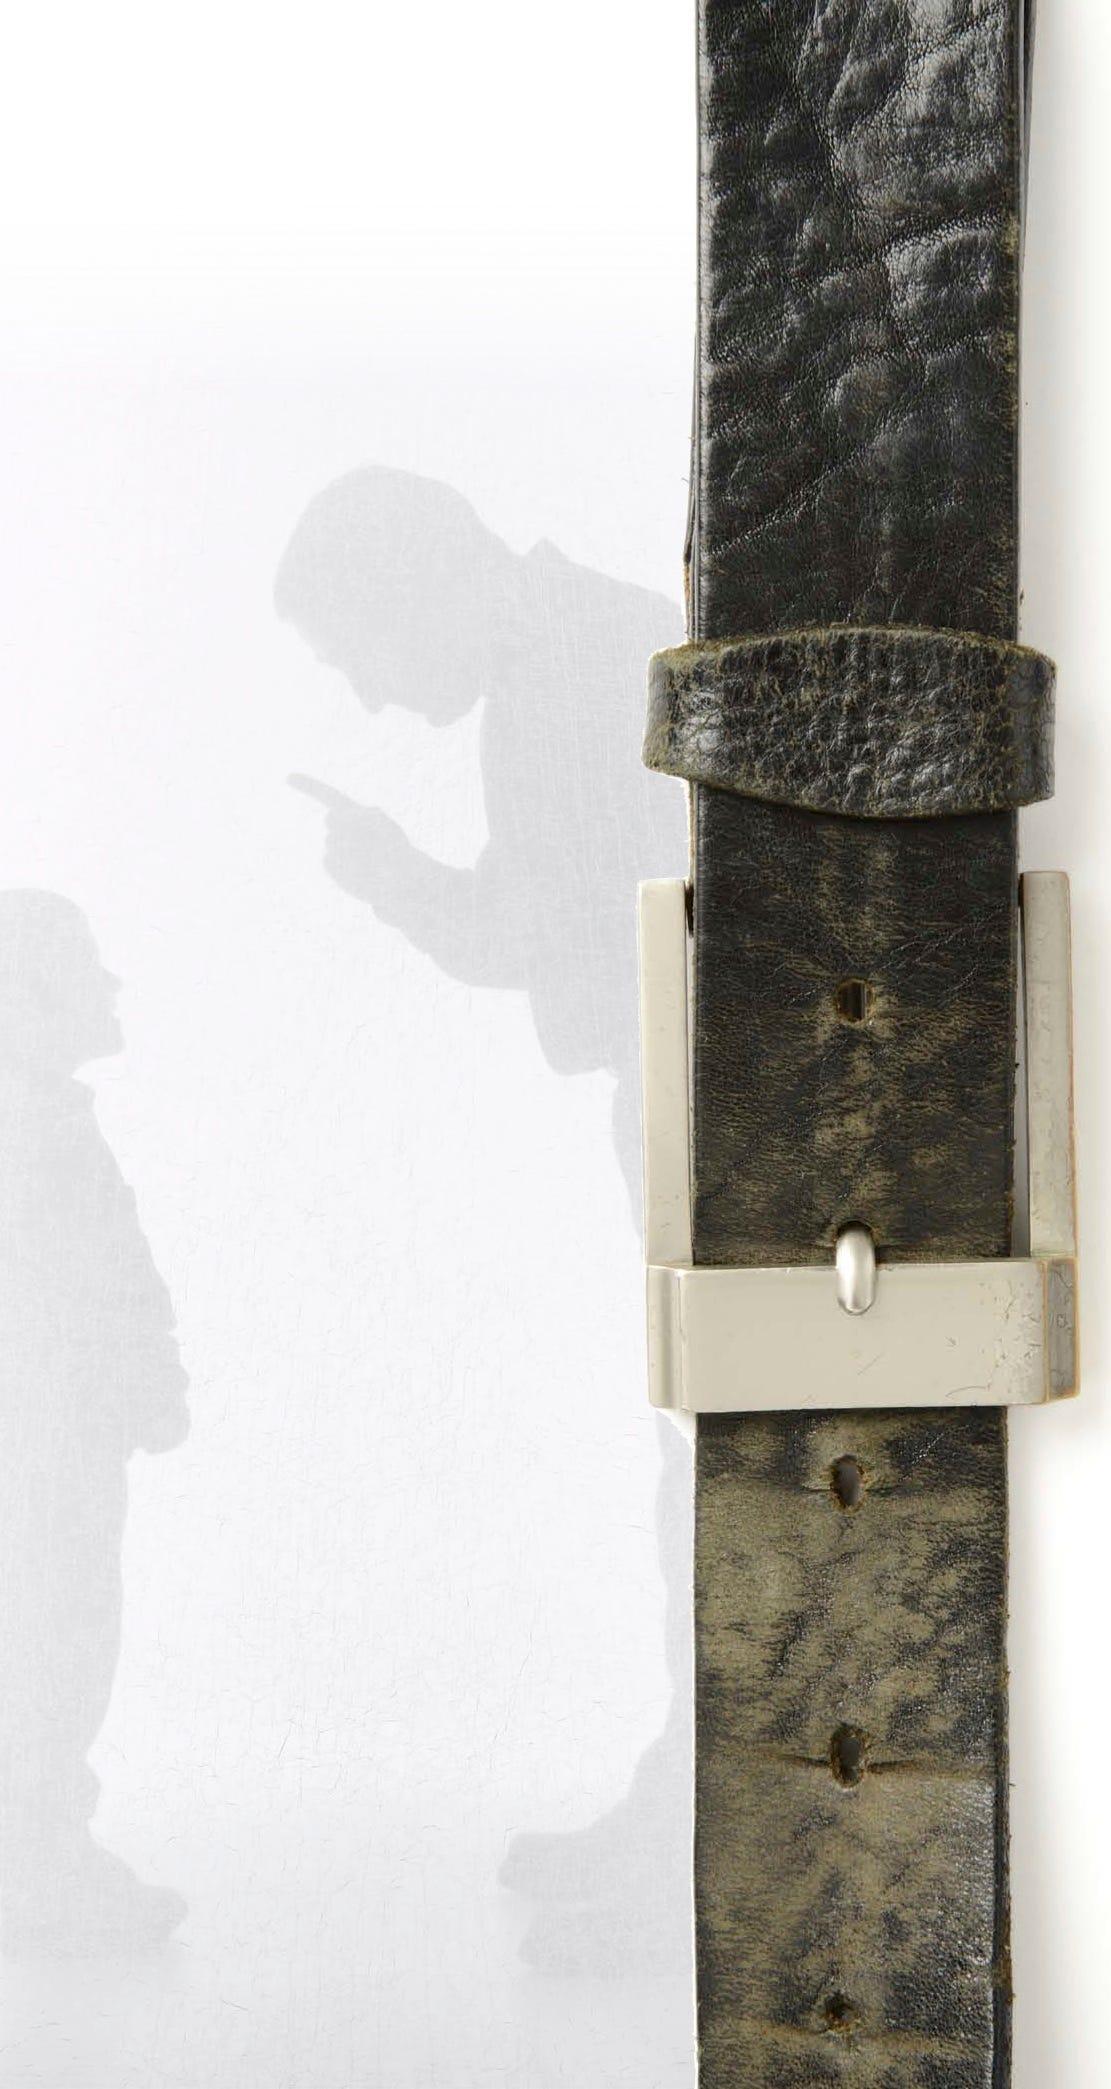 Tiny teen spanked with belt porn photos 129